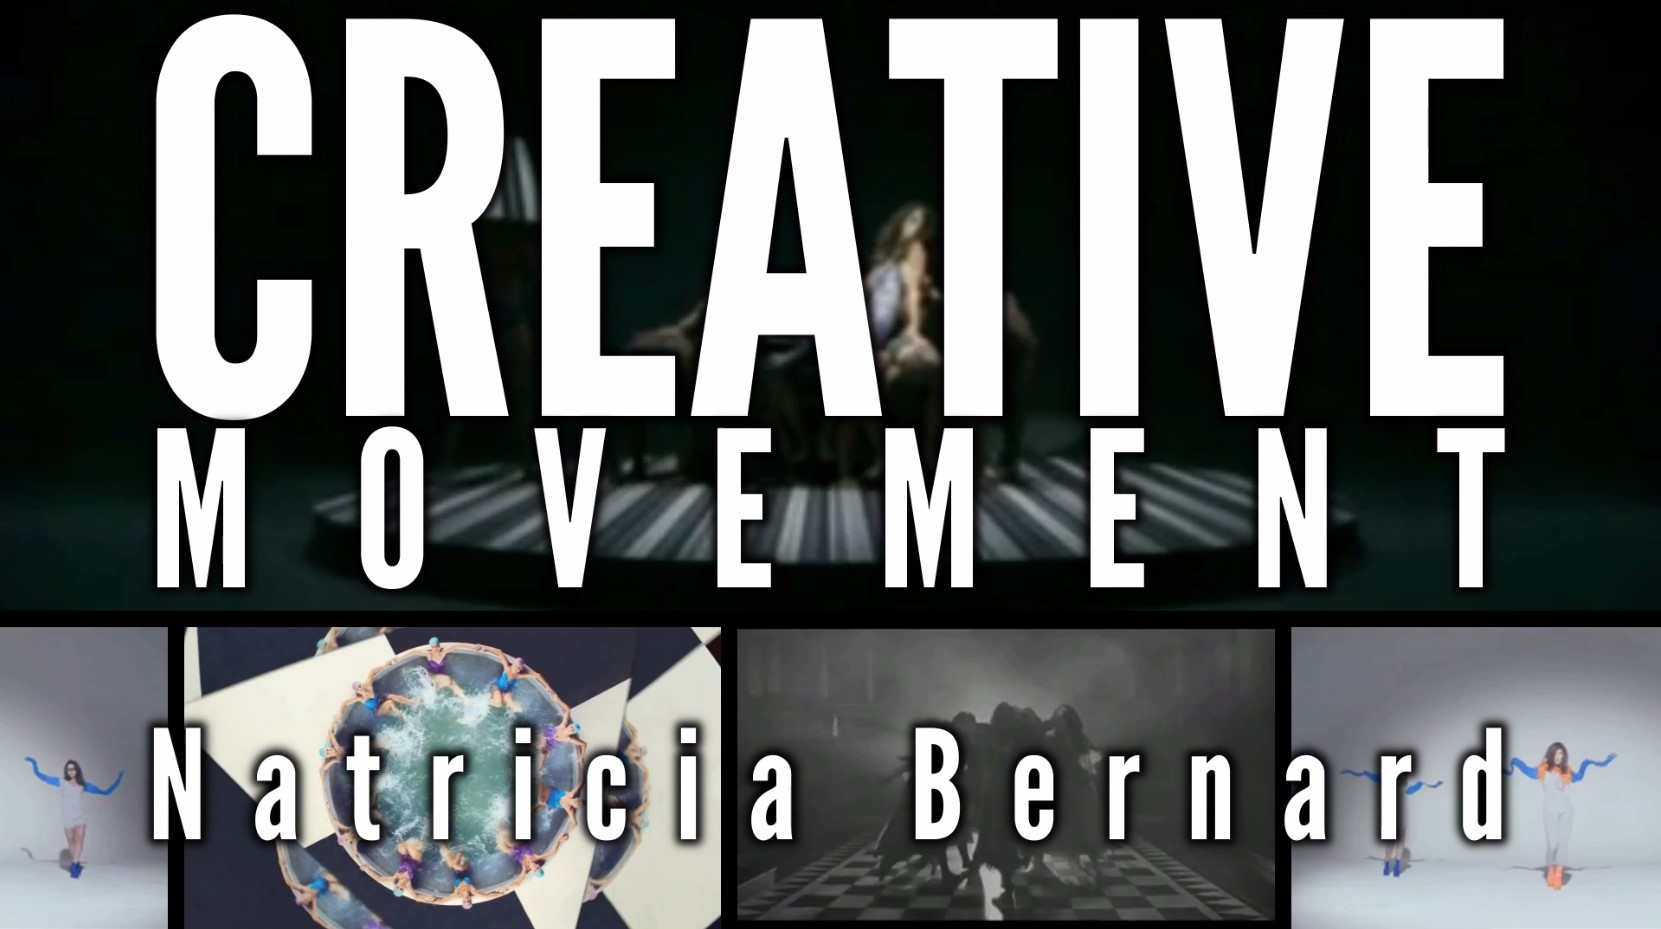 Creative Showreel Coming Soon